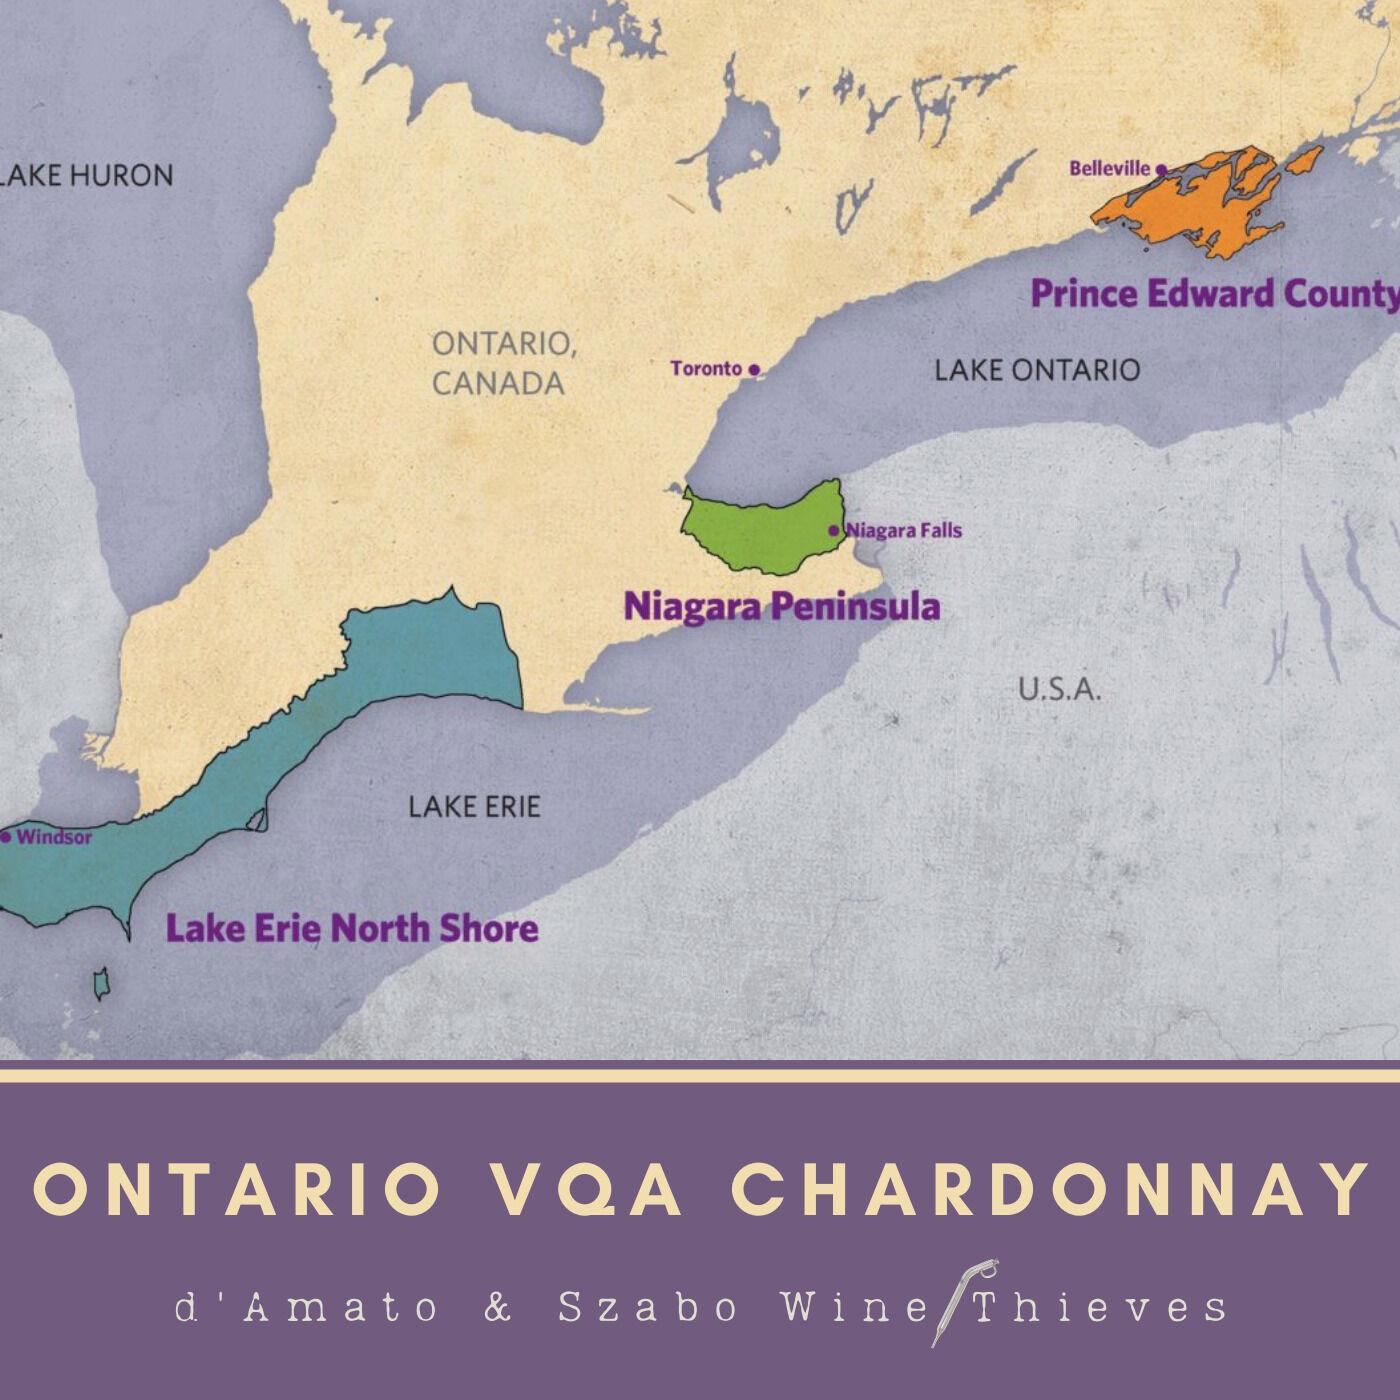 Ontario VQA Chardonnay